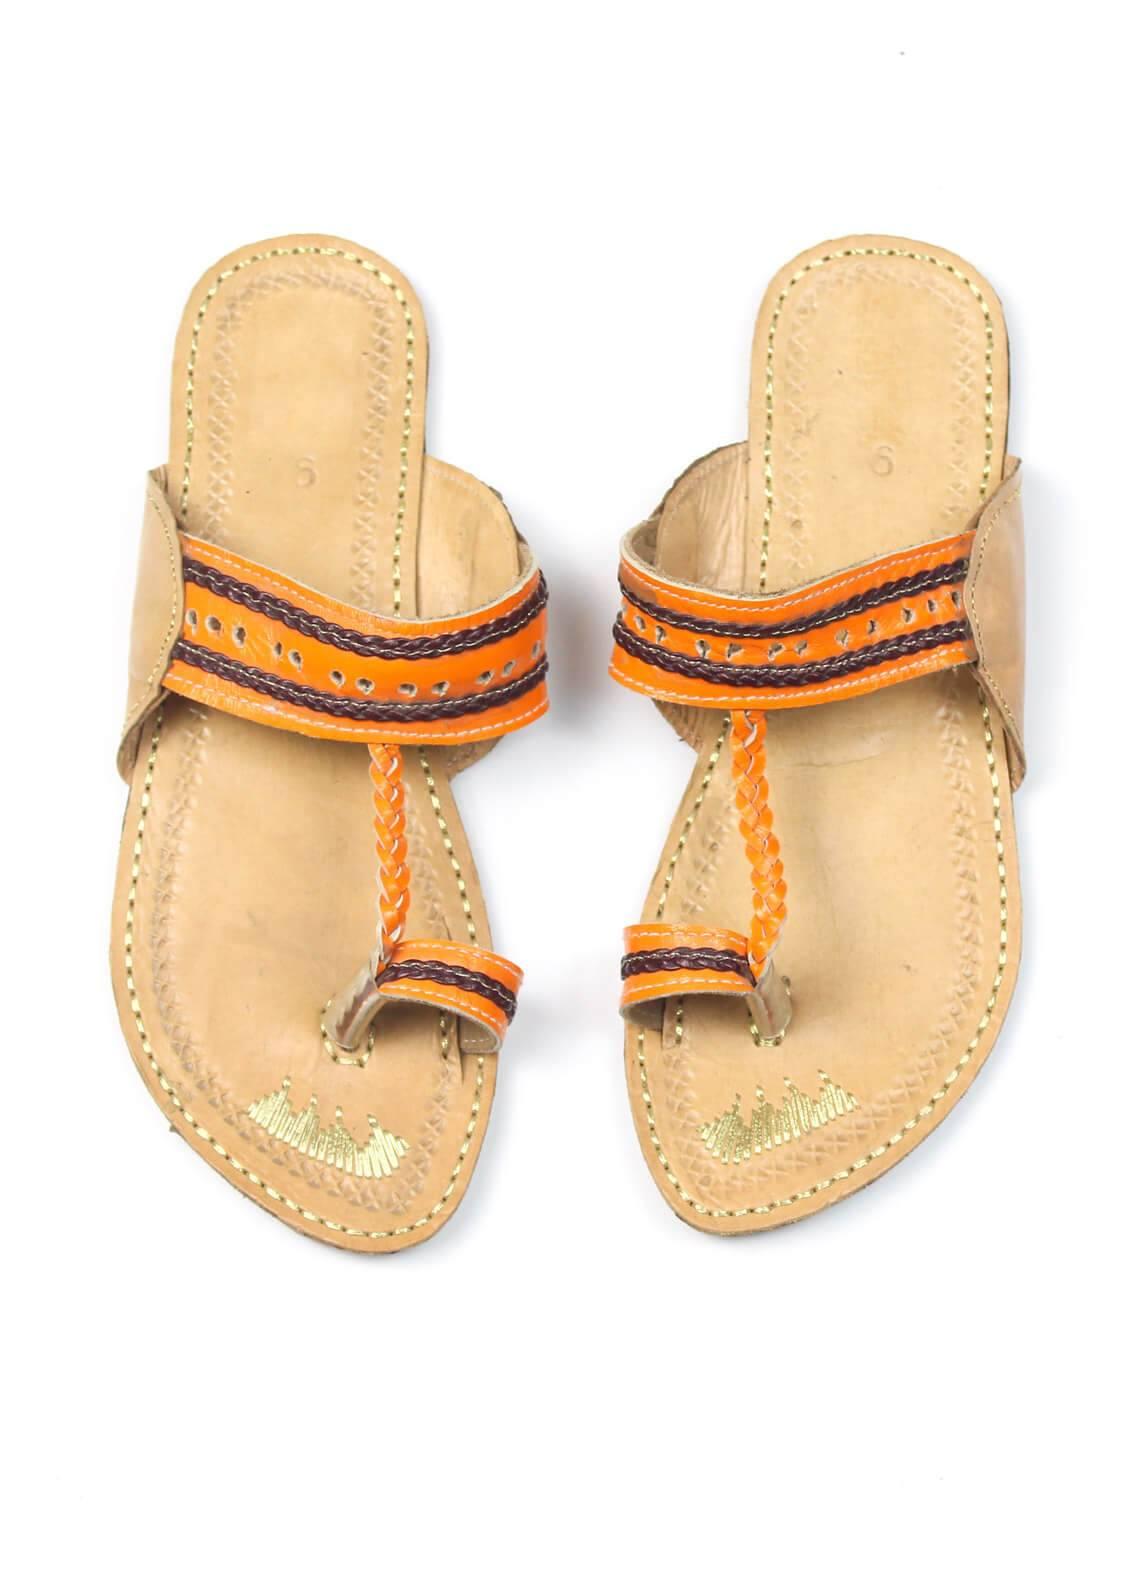 Silk Avenue Kolapuri Style Leather Flat Shoes SAF09-Orange